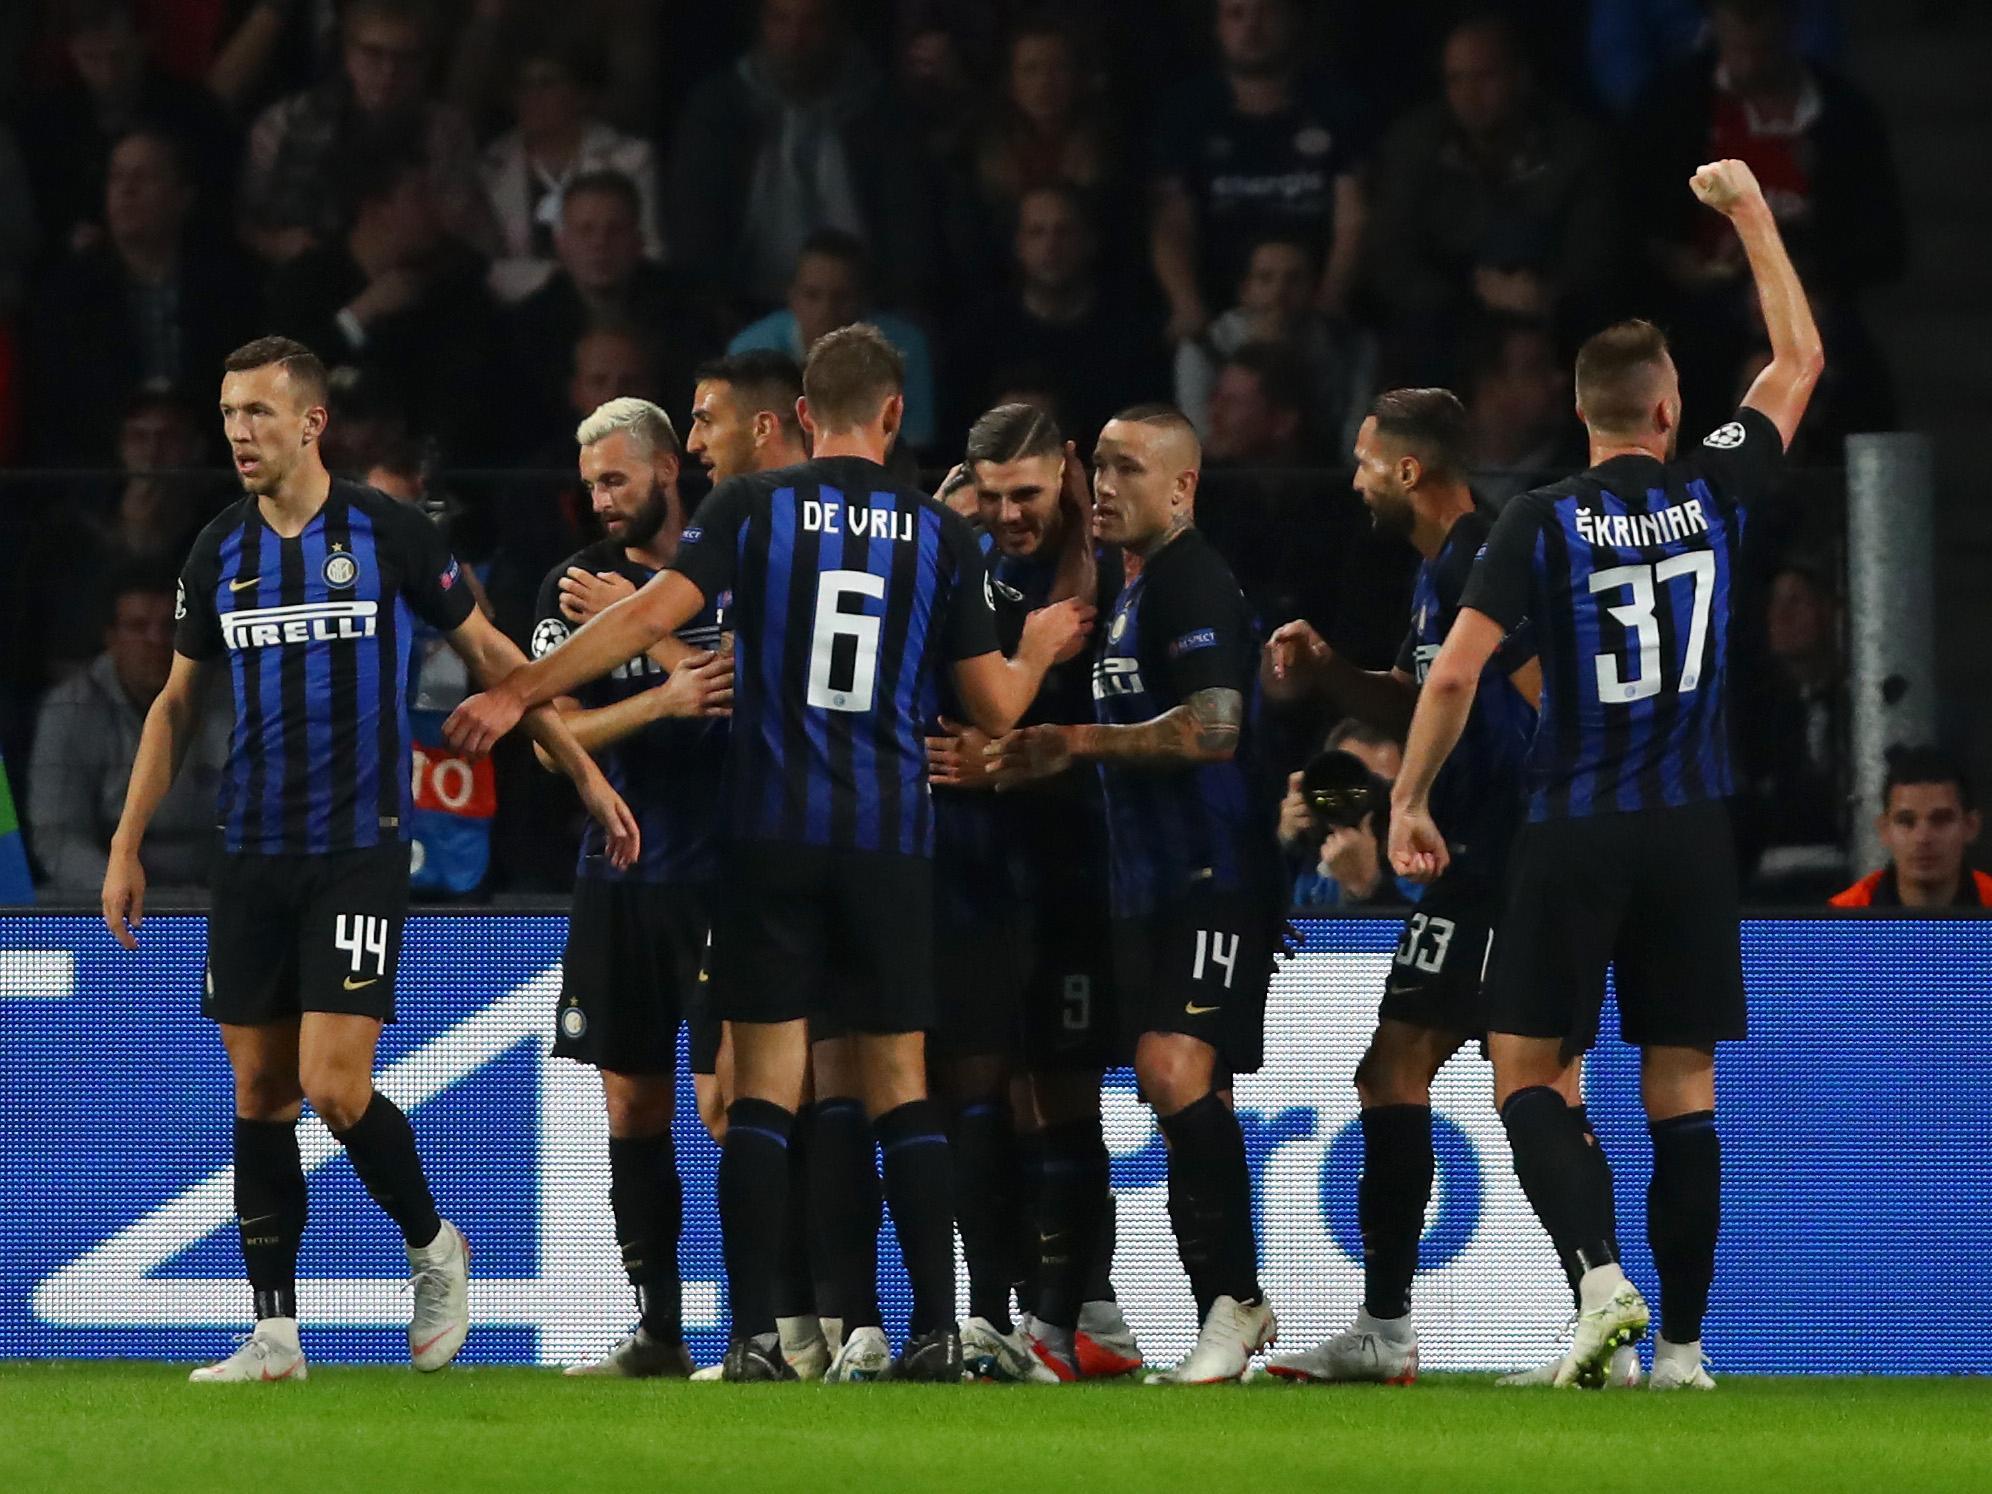 PSV Eindhoven 1-2 Inter Milan